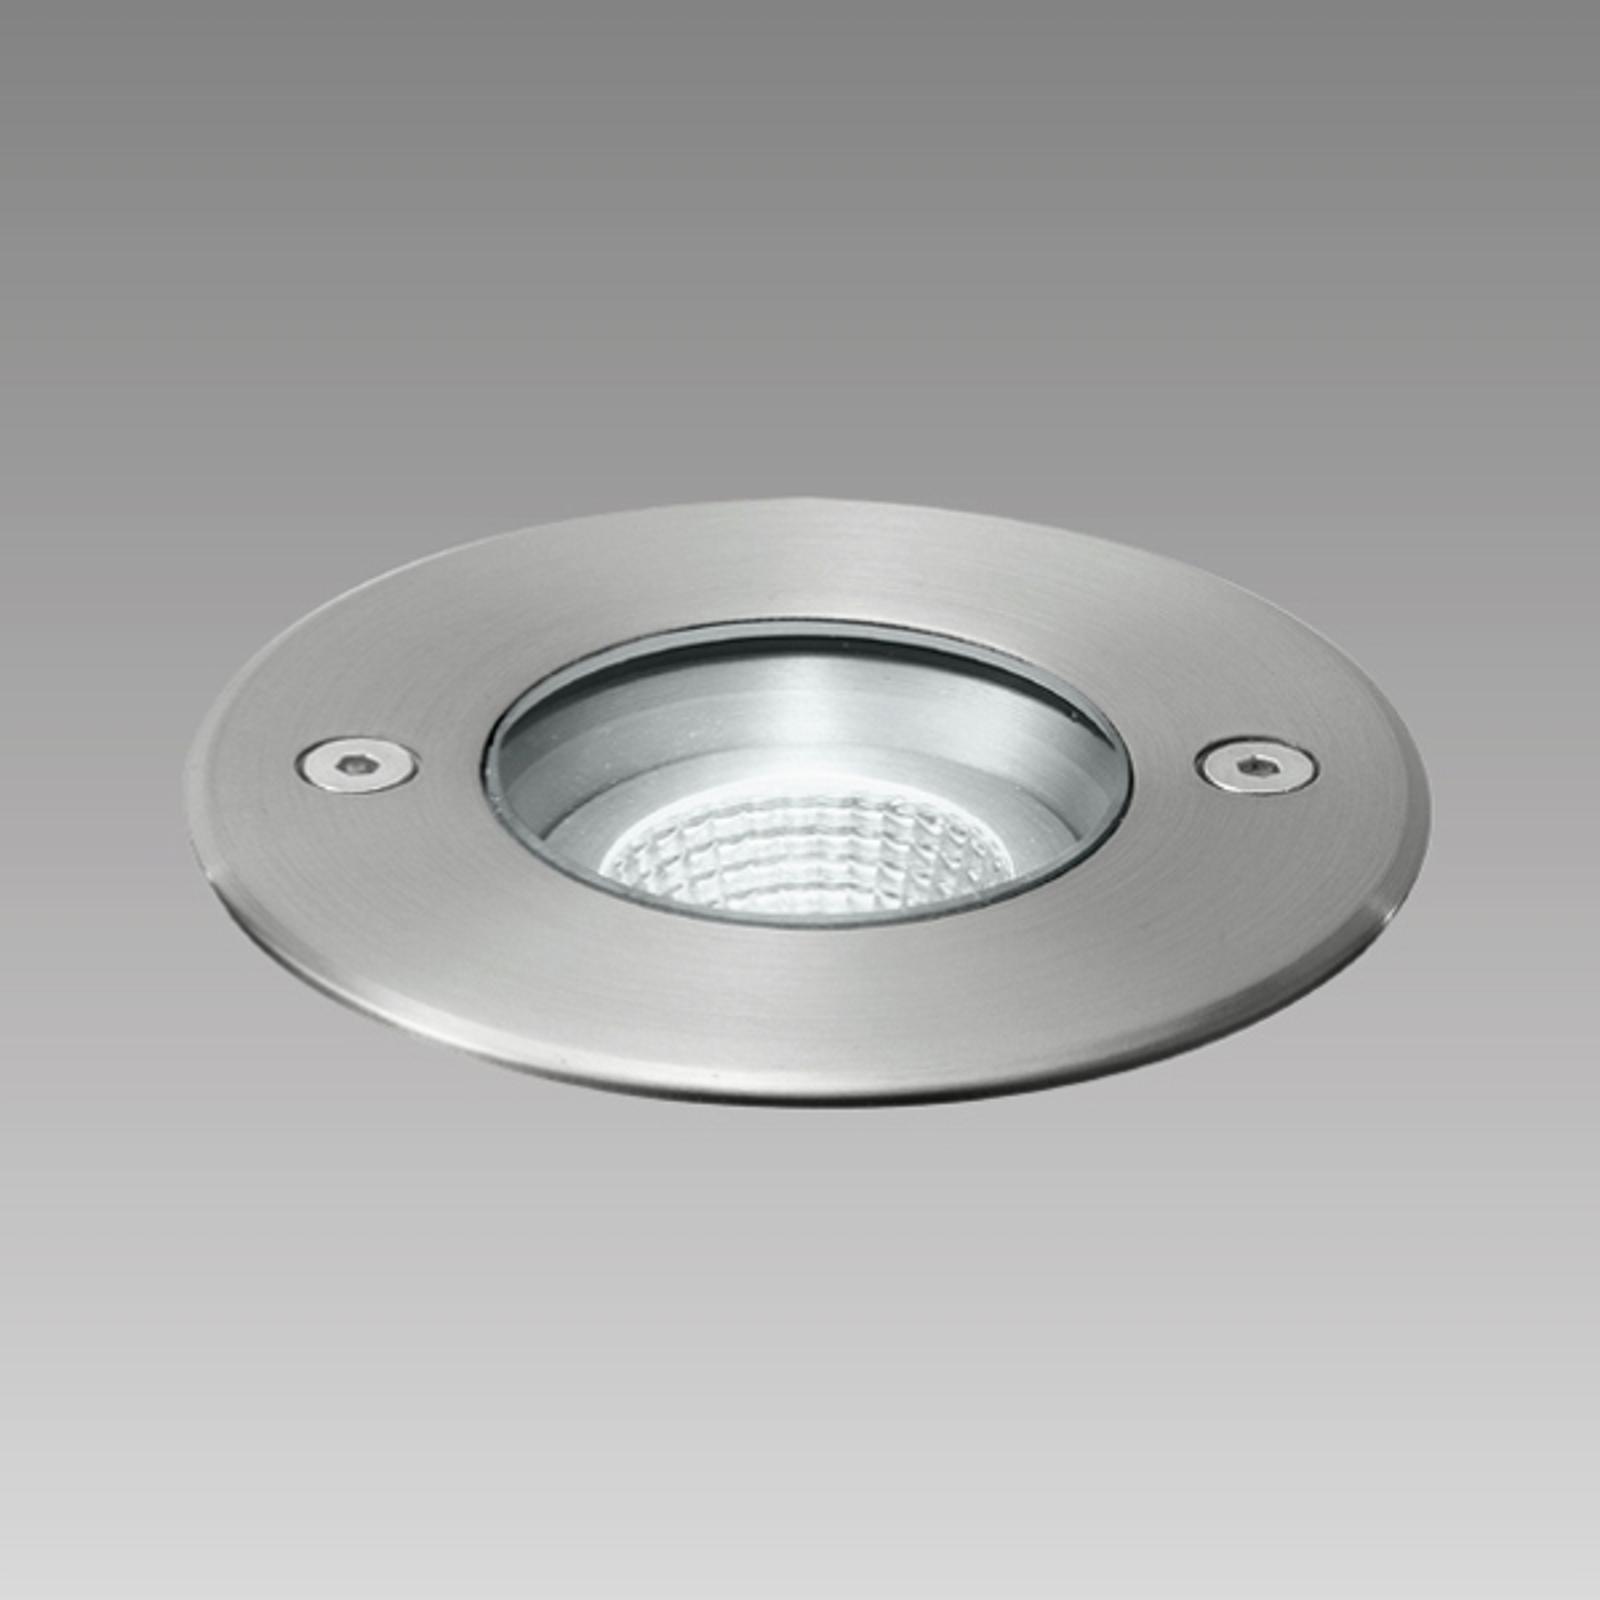 Spot wpuszczany stal szlachetna Frisco LED, IP67